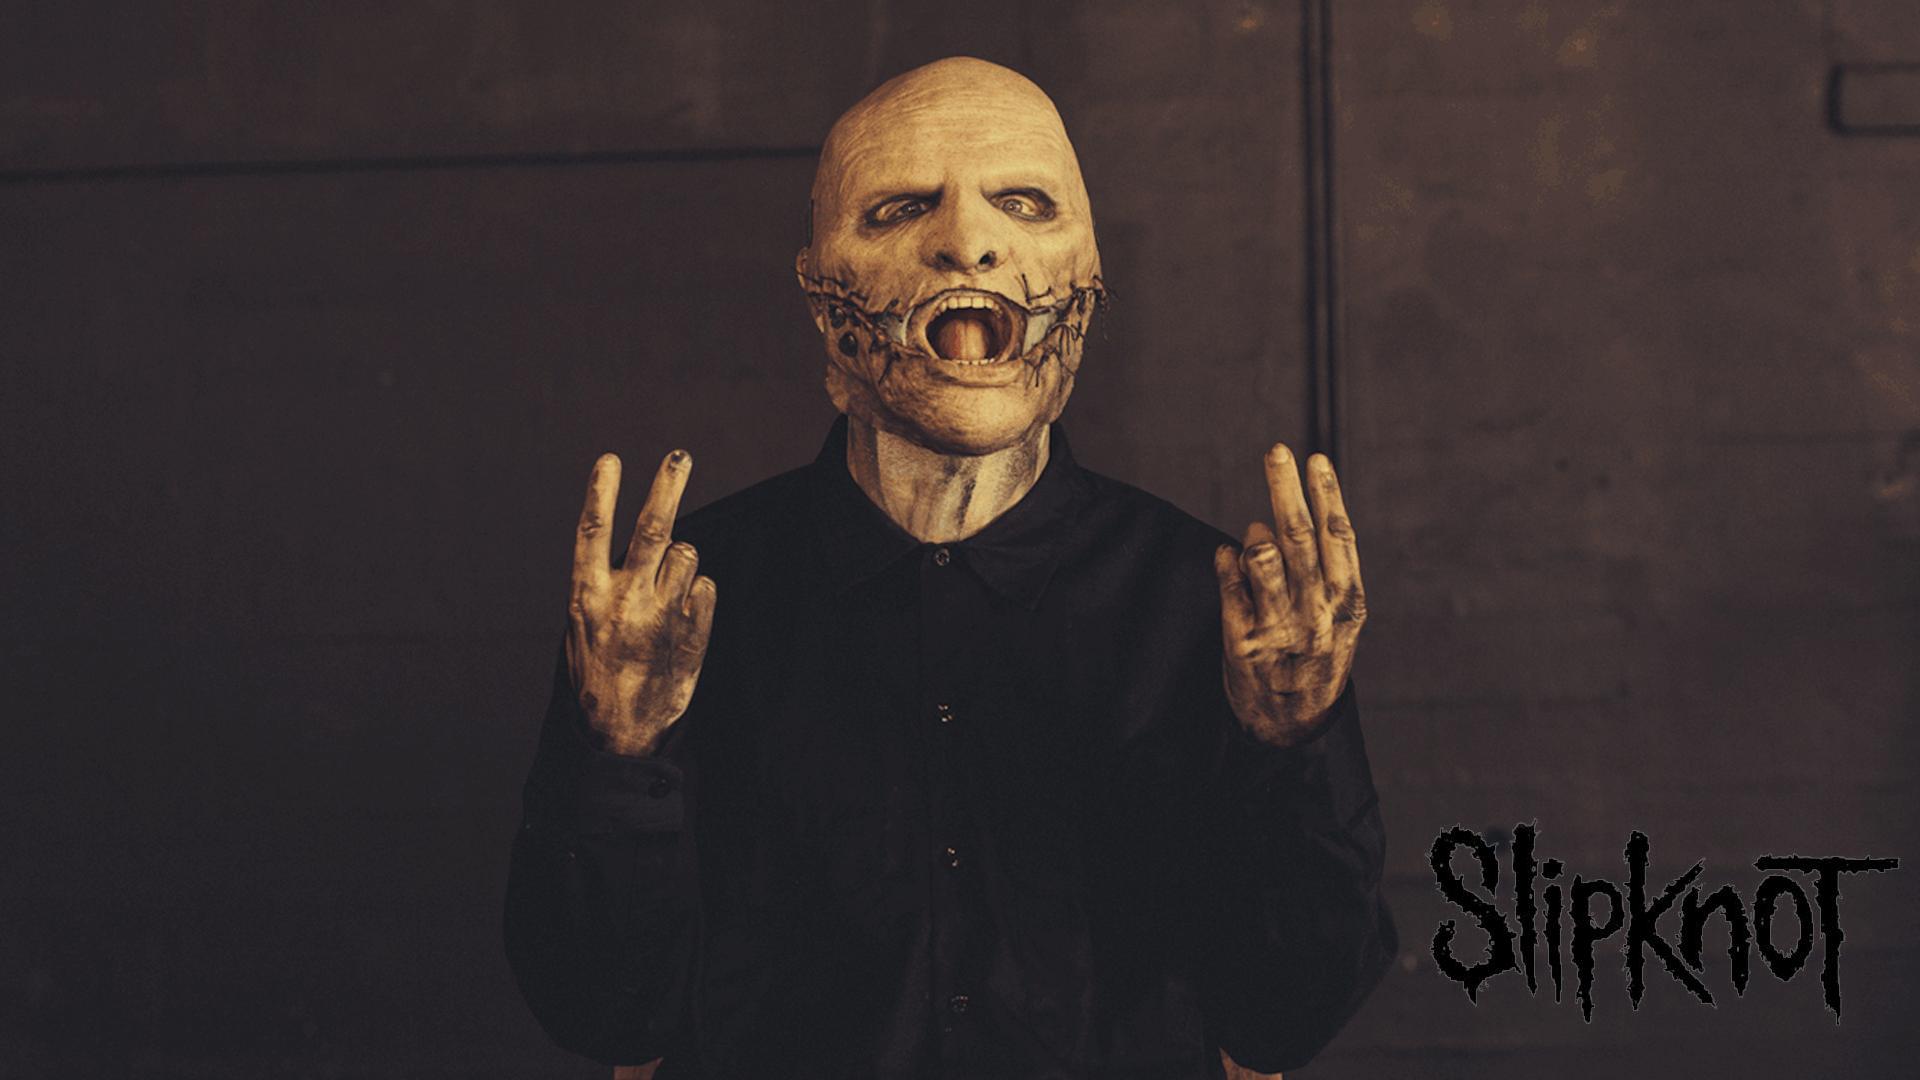 General 1920x1080 Corey Taylor Slipknot mask